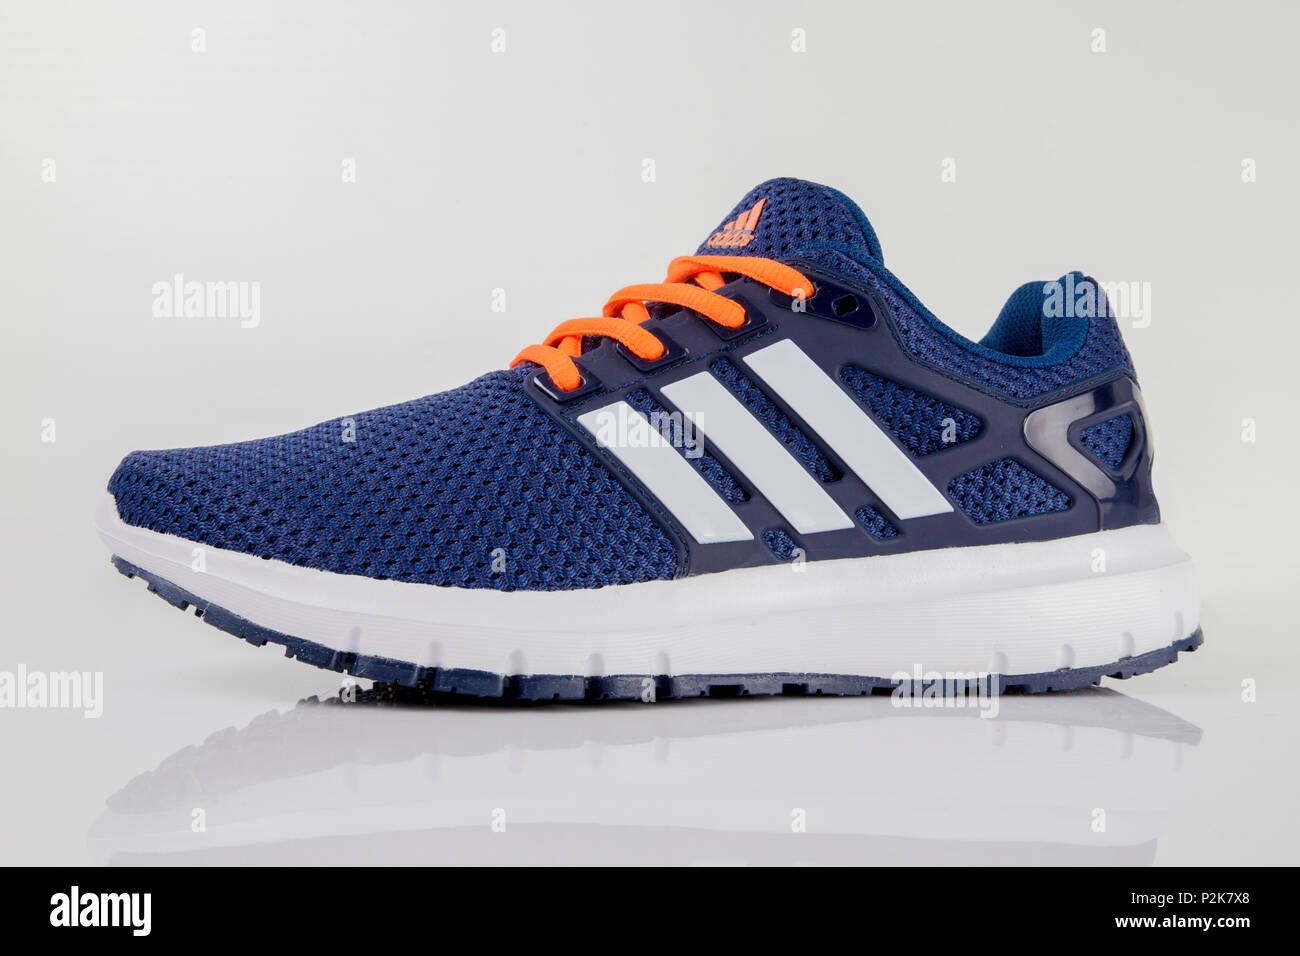 Modernizar incidente zona  Afife, Portugal - June 11, 2018: Adidas Running boots. Adidas,  multinational company. Isolated on white. Product shots Stock Photo - Alamy